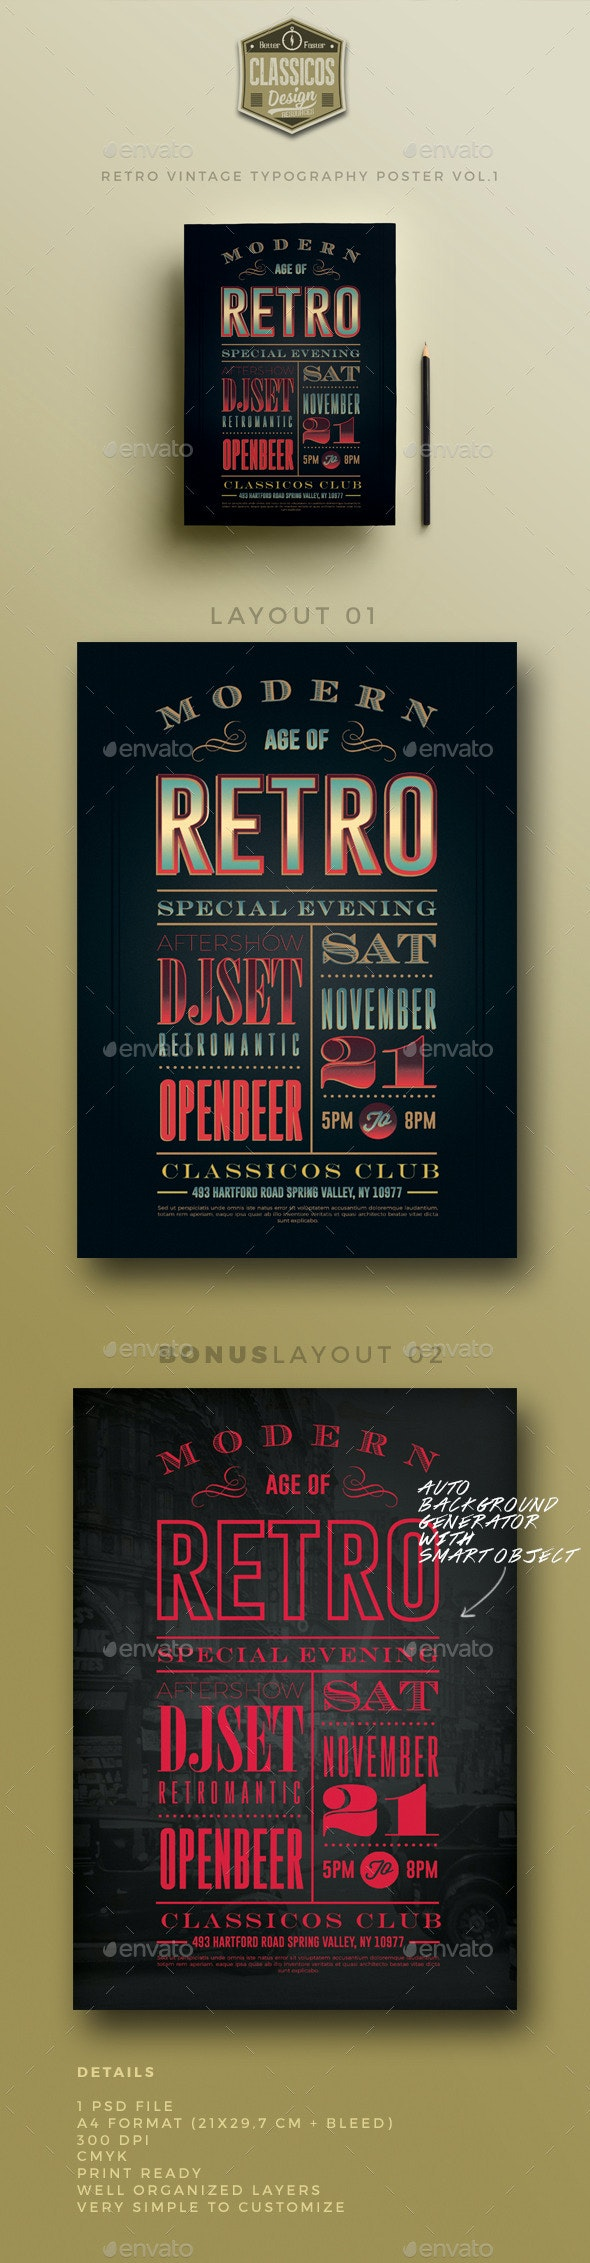 Retro vintage typography poster VOL.1 - Events Flyers